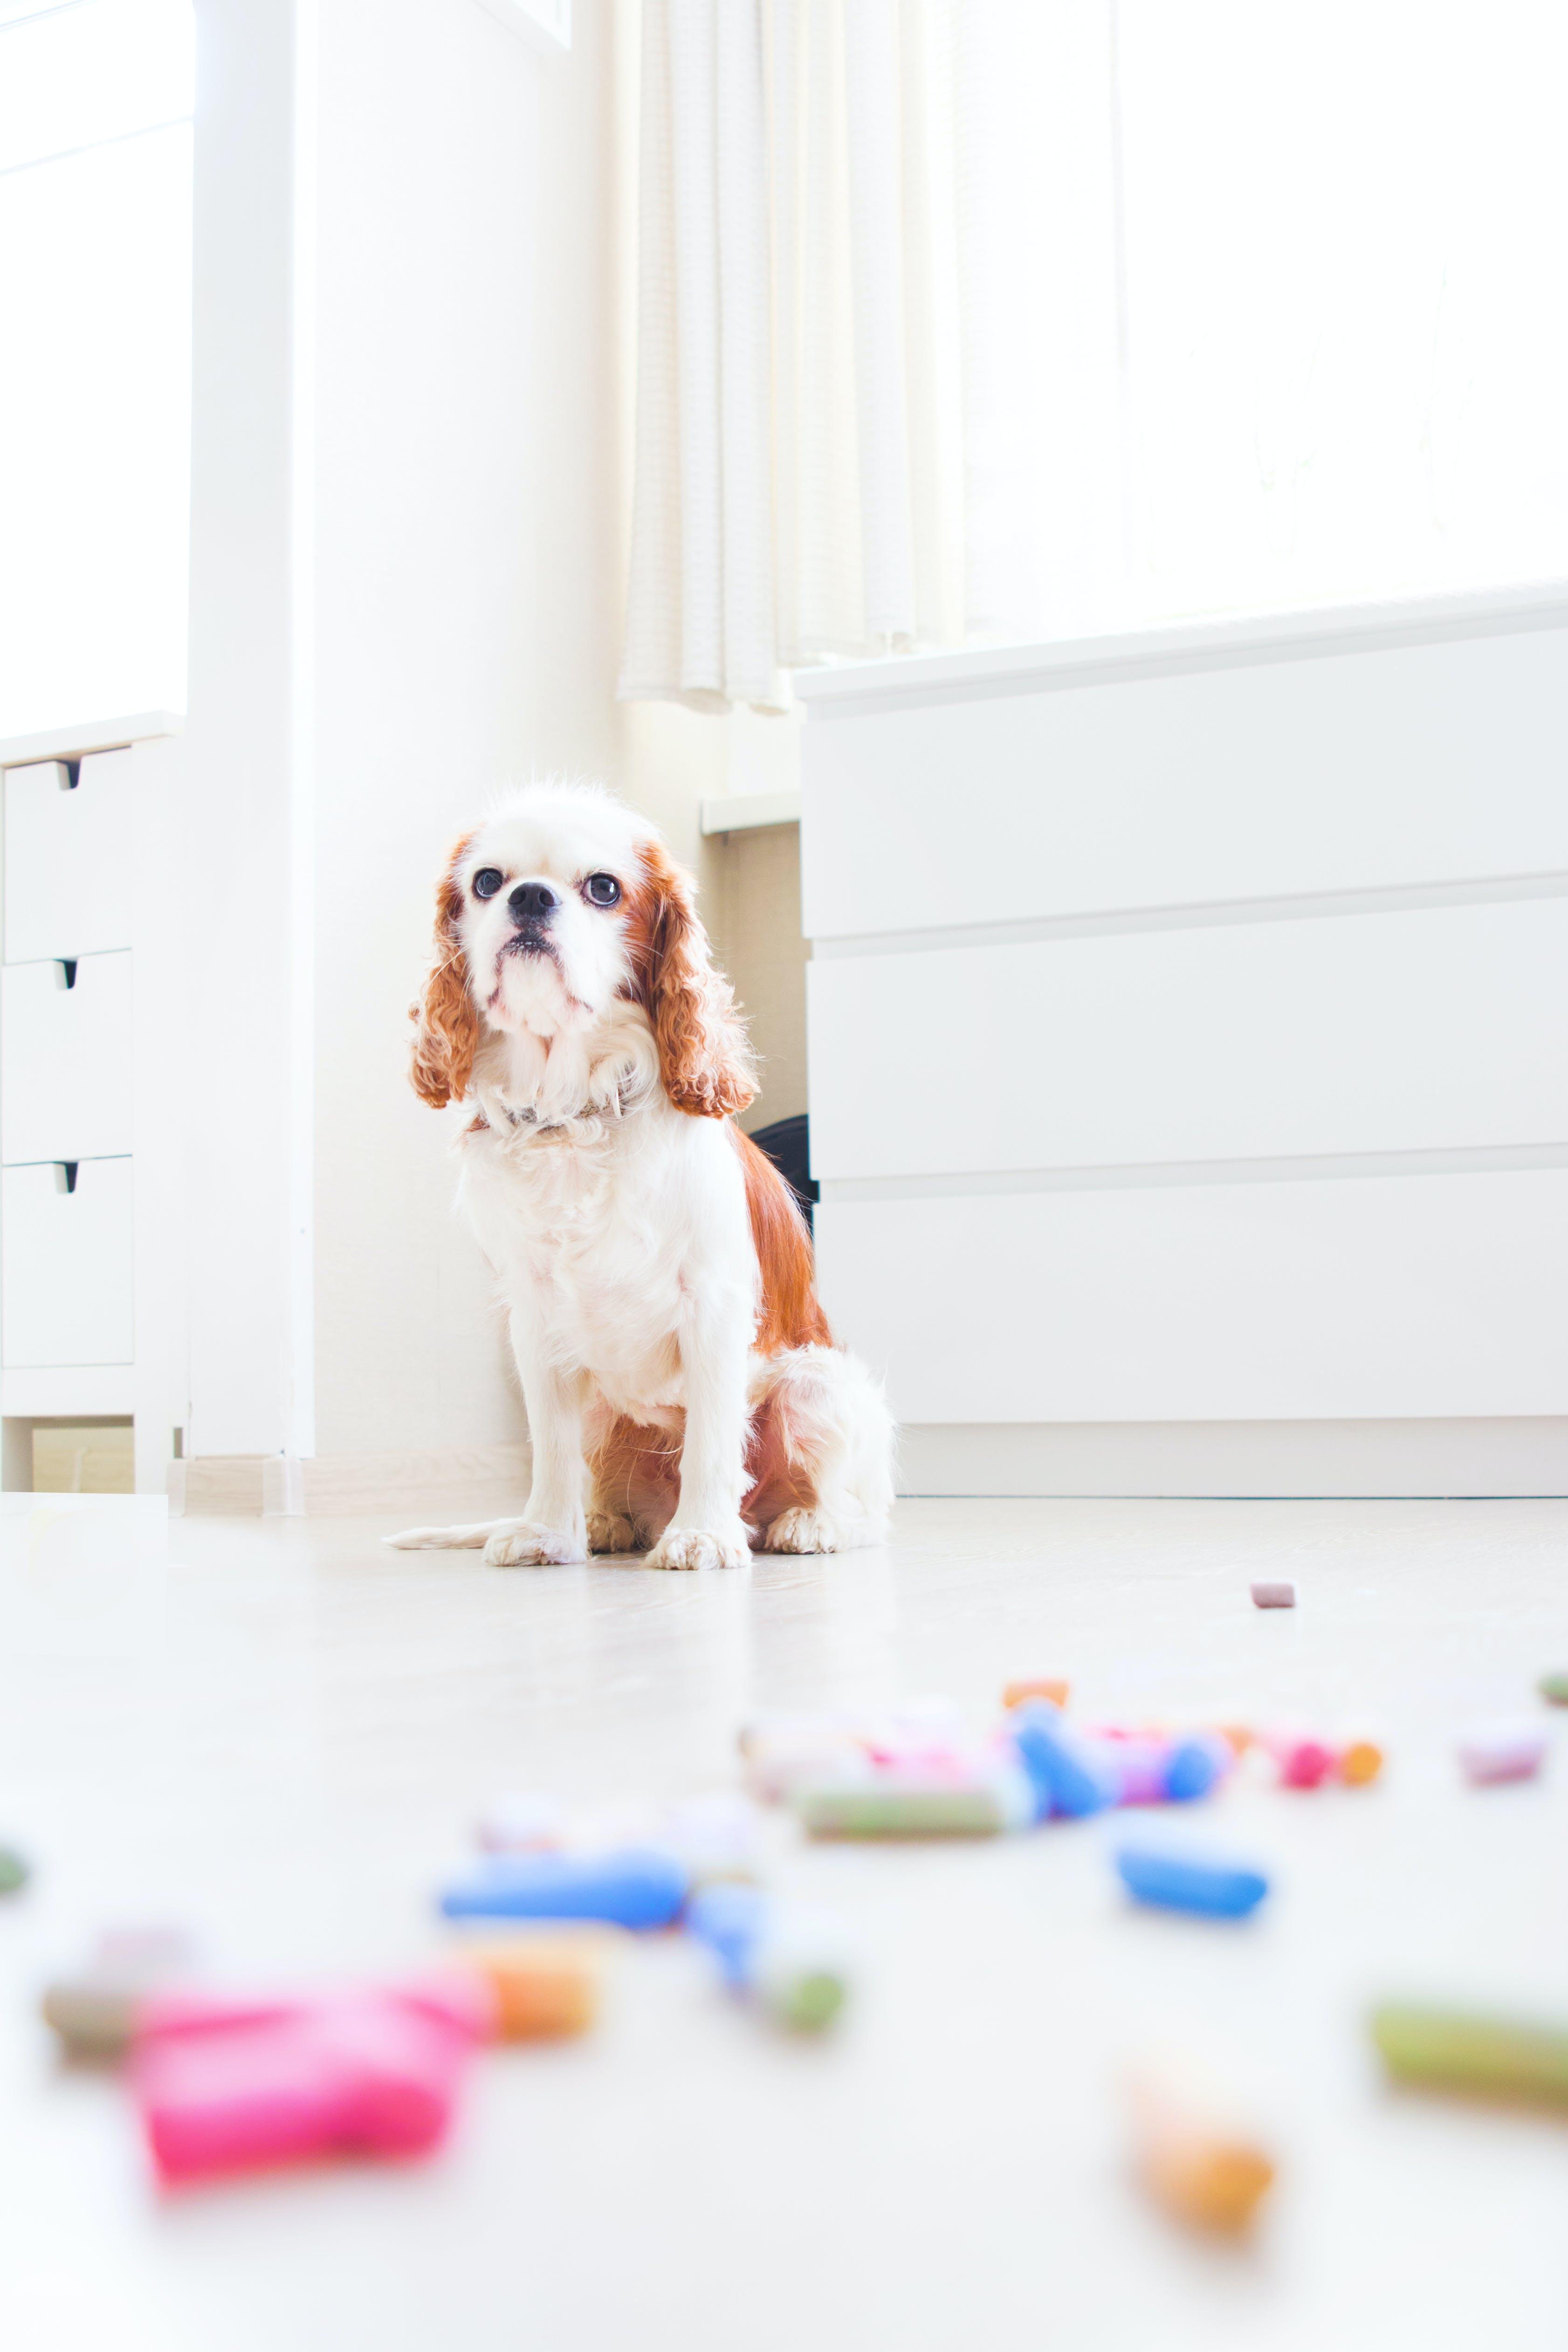 Pet Dog Sitting Down on Floor